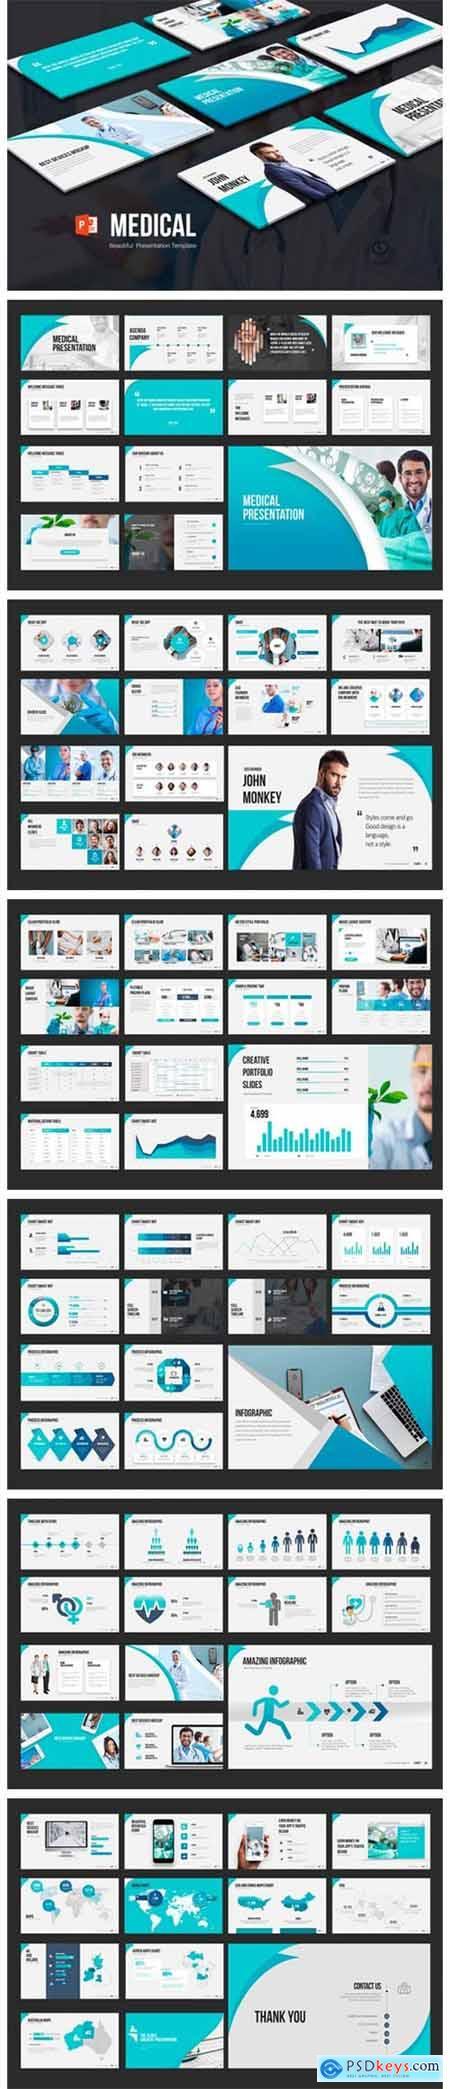 Medical PowerPoint Presentation 7157585